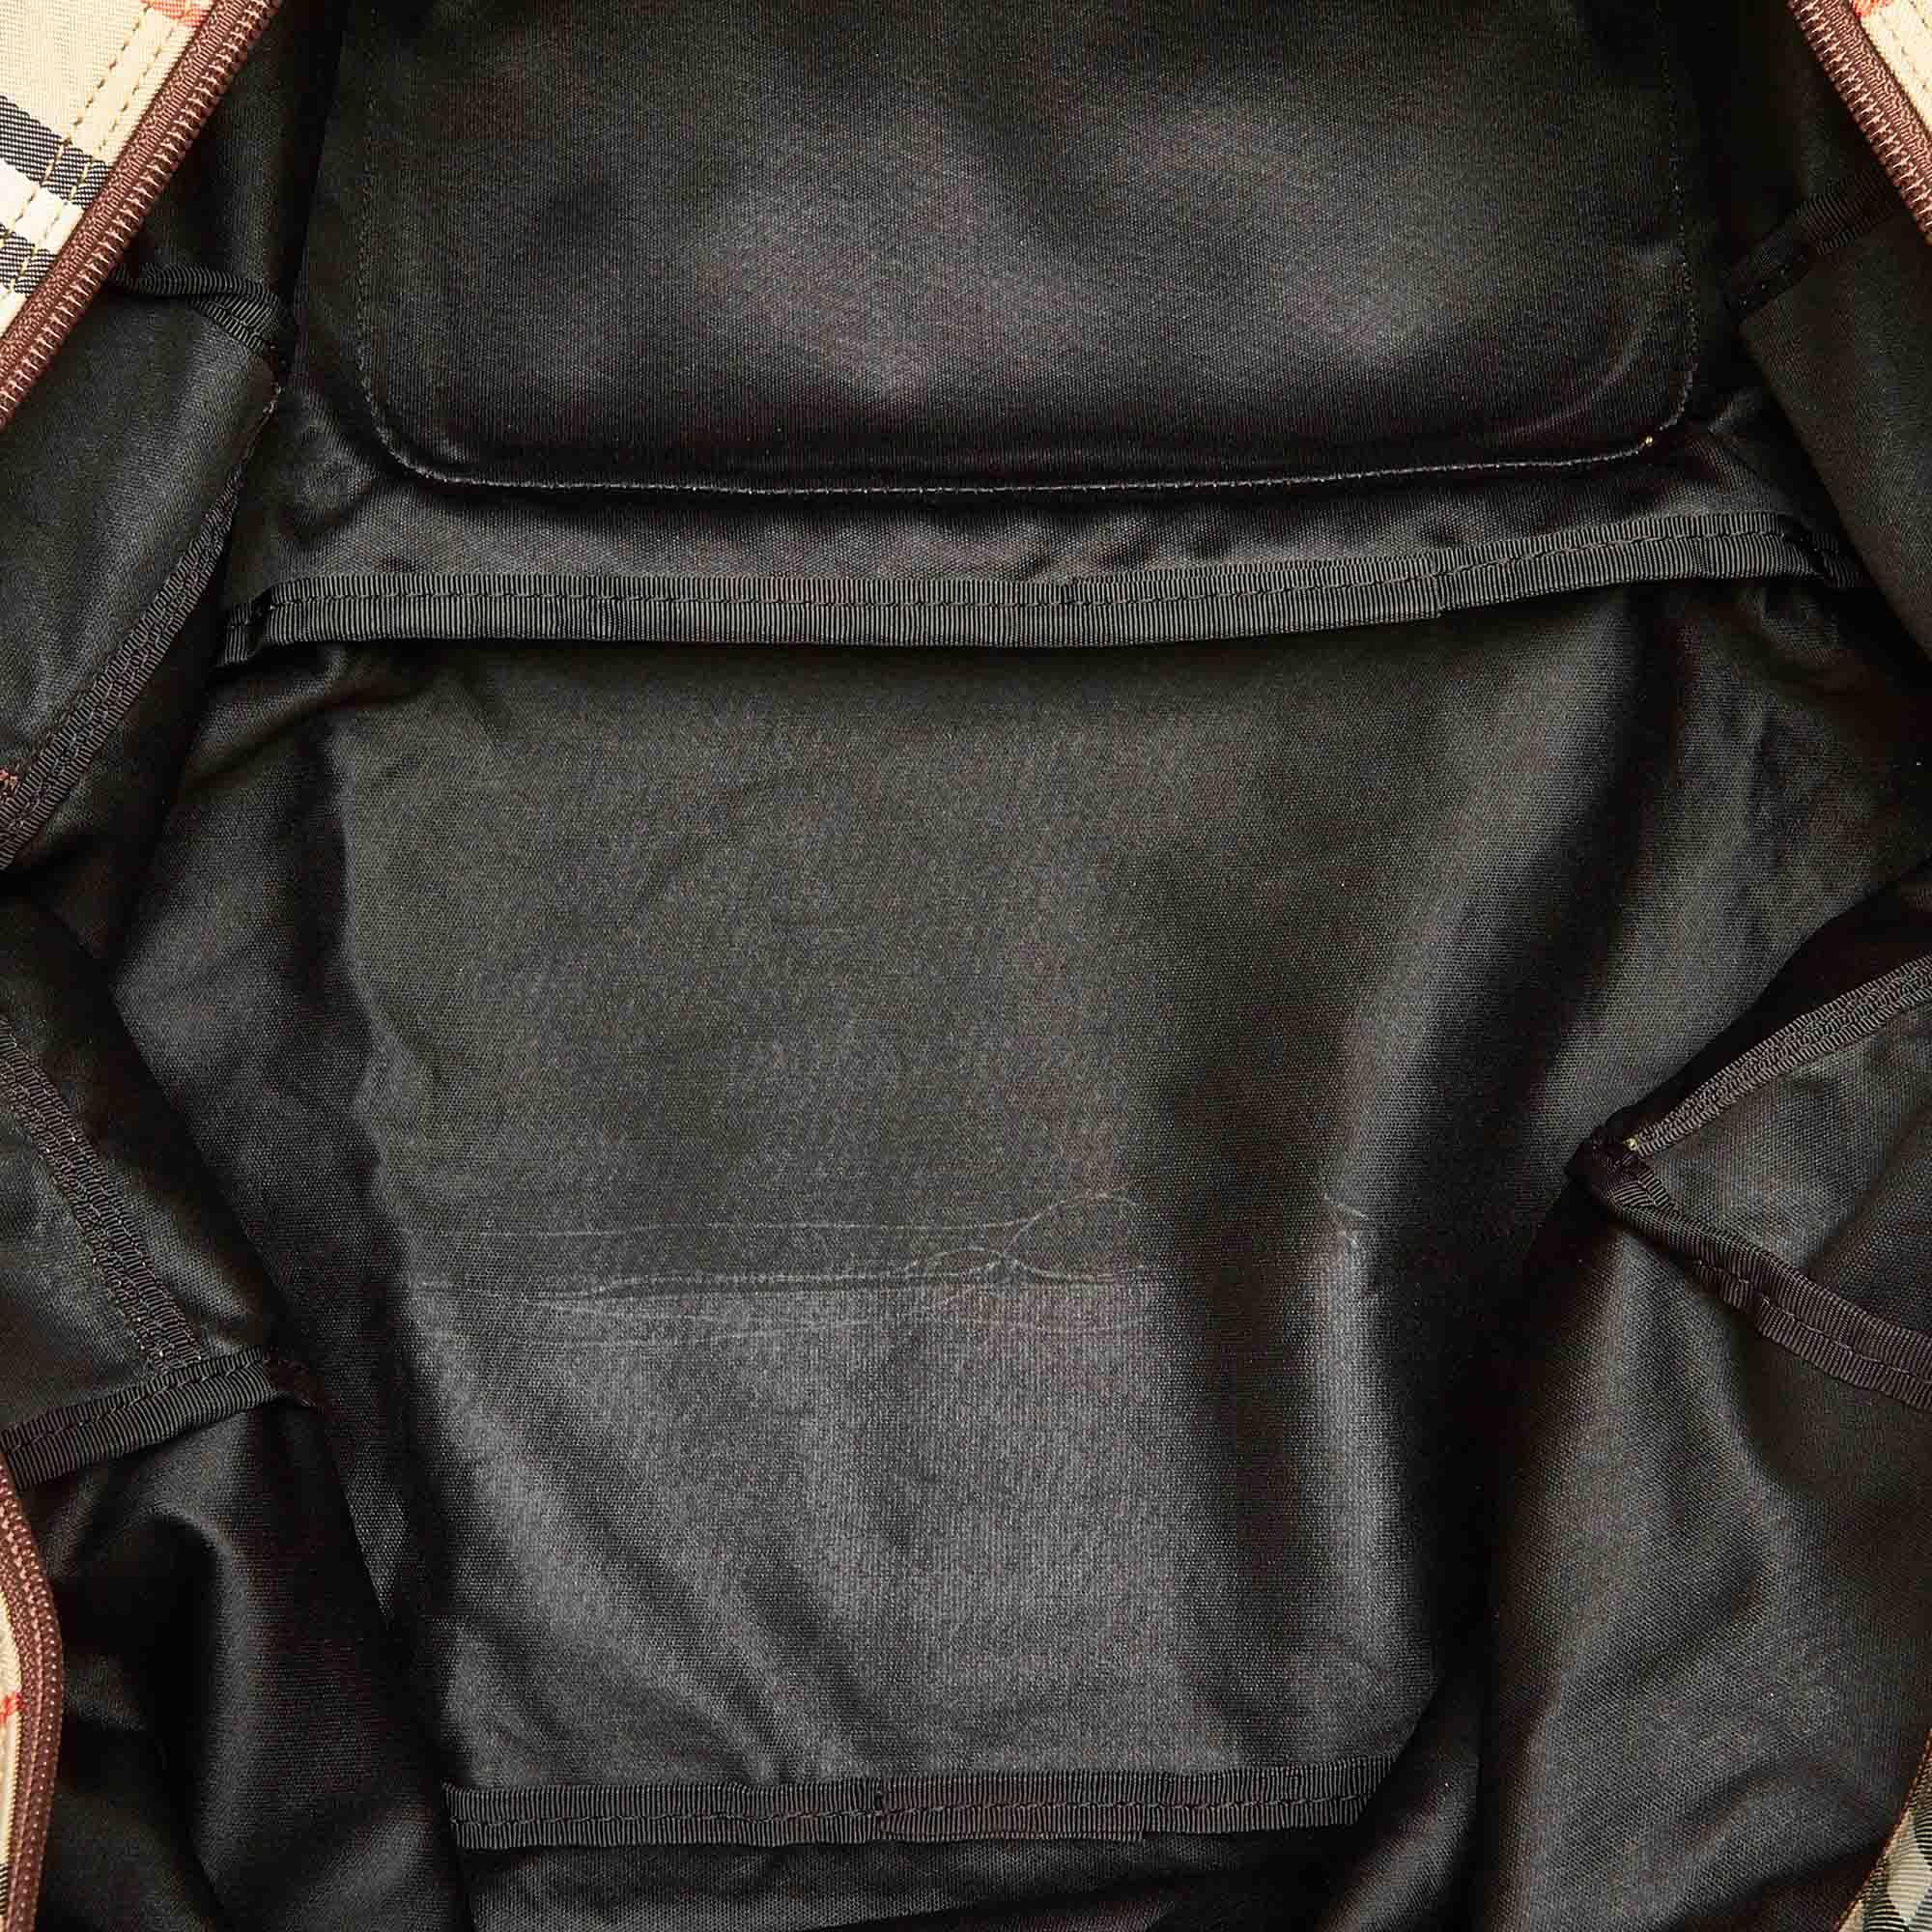 Vintage Burberry House Check Canvas Travel Bag Brown